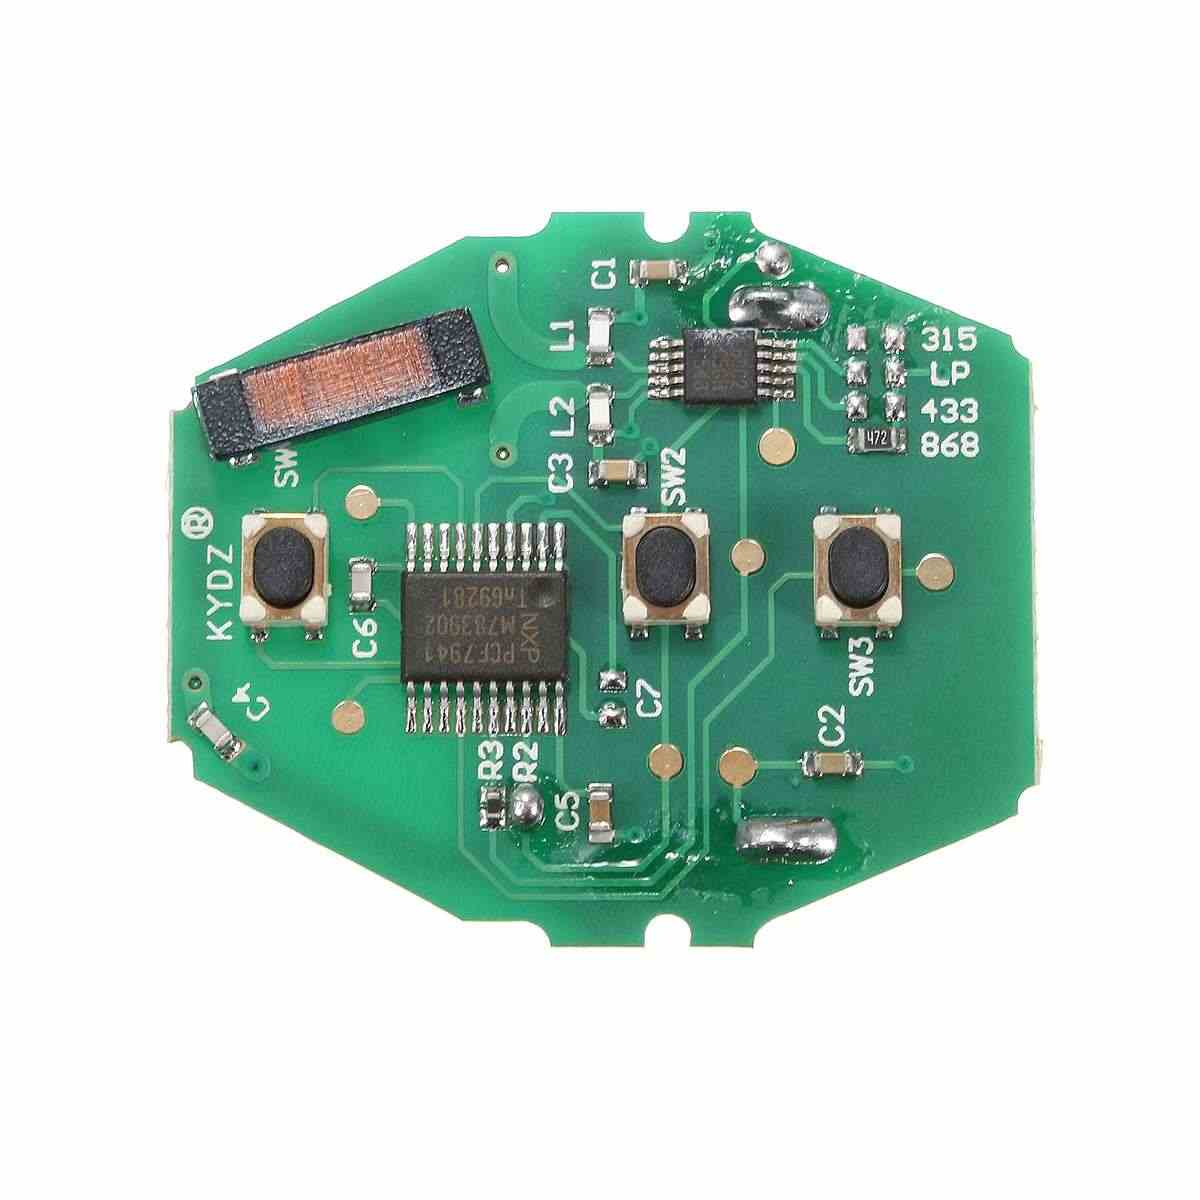 Panas 1 Pcs 3 Tombol Uncut Remote Kunci Fob 868MHz ID7944 untuk BMW CAS2 3/5/7 Series E46 e60 E83 E53 E36 E38 E39 HU92 Bagian Pengganti